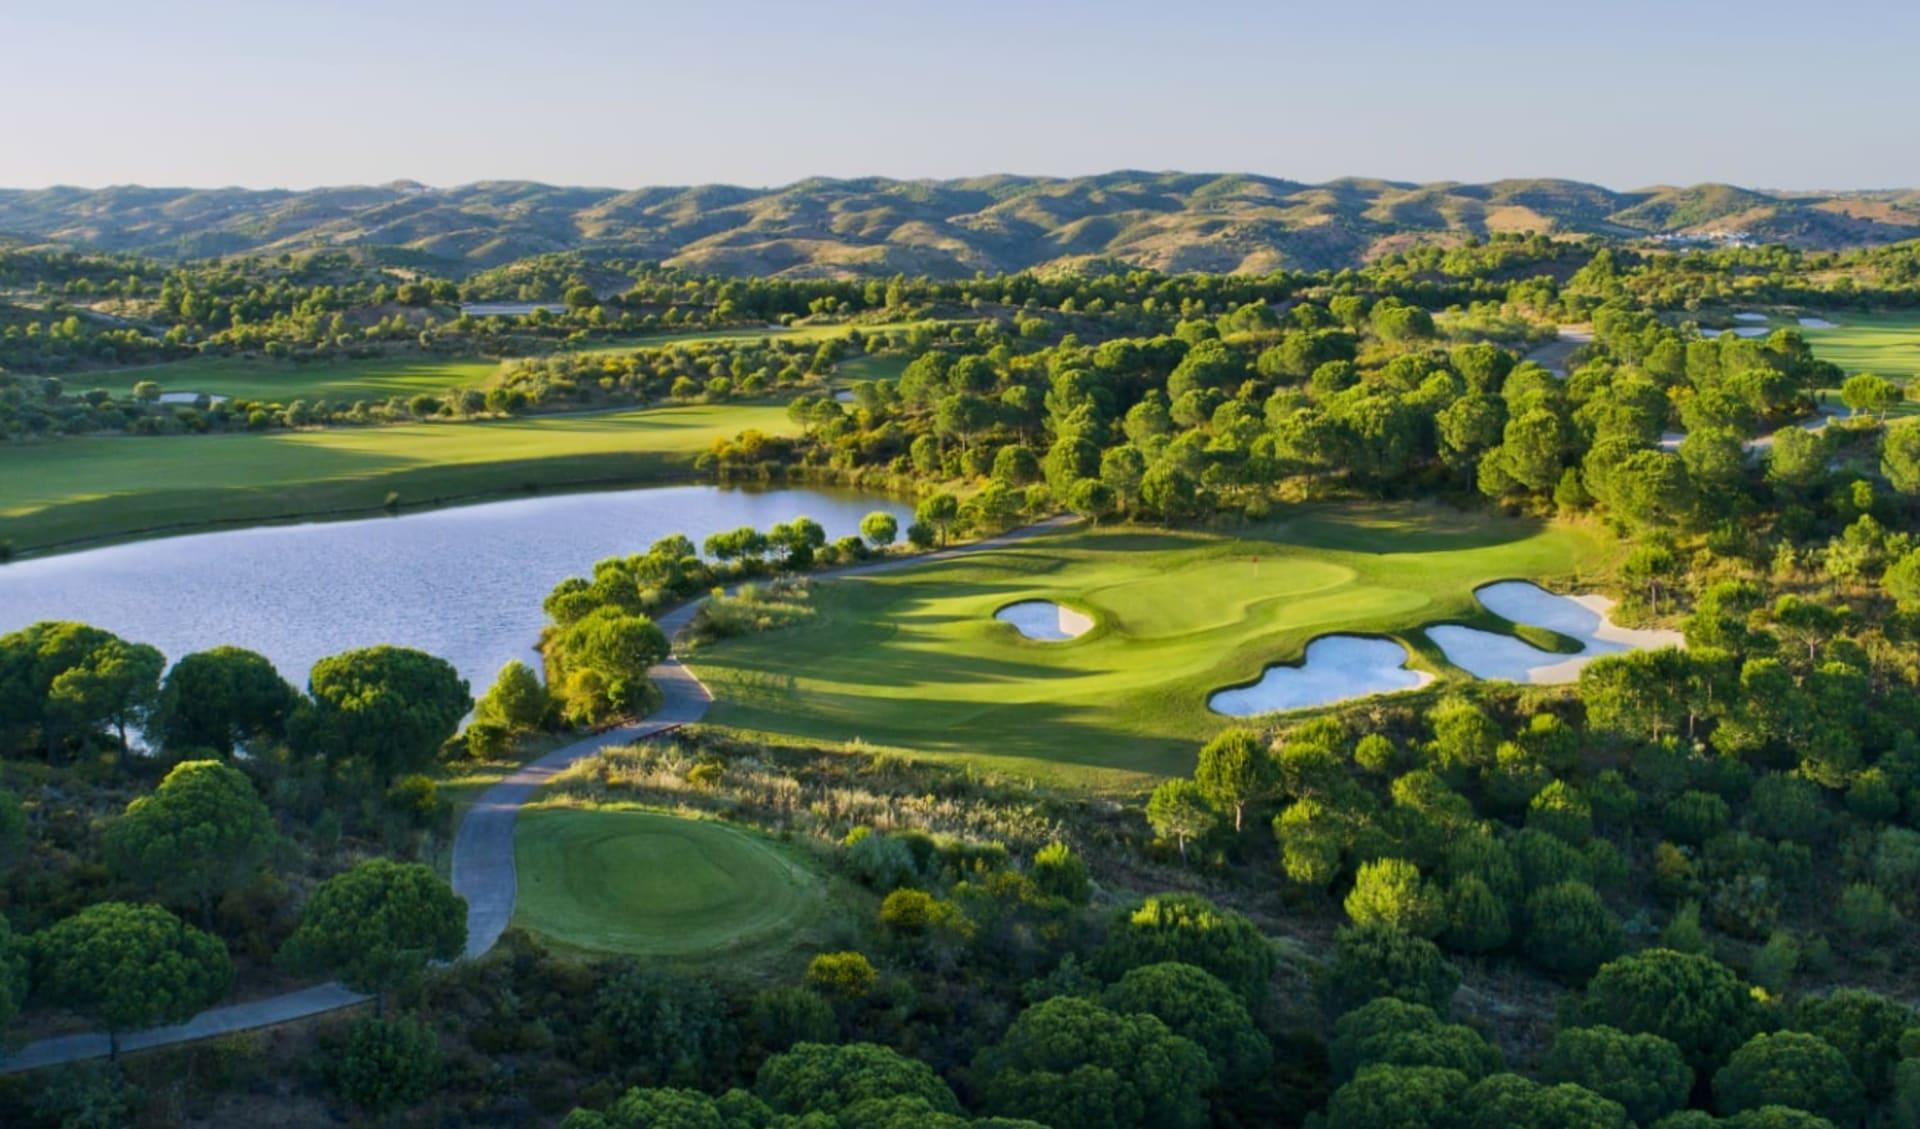 Monte Rei Golf & Country Club in Algarve: Monte Rei Golf & Country Club Portugal_General View 1_(c) Monte Rei Golf & Country Club